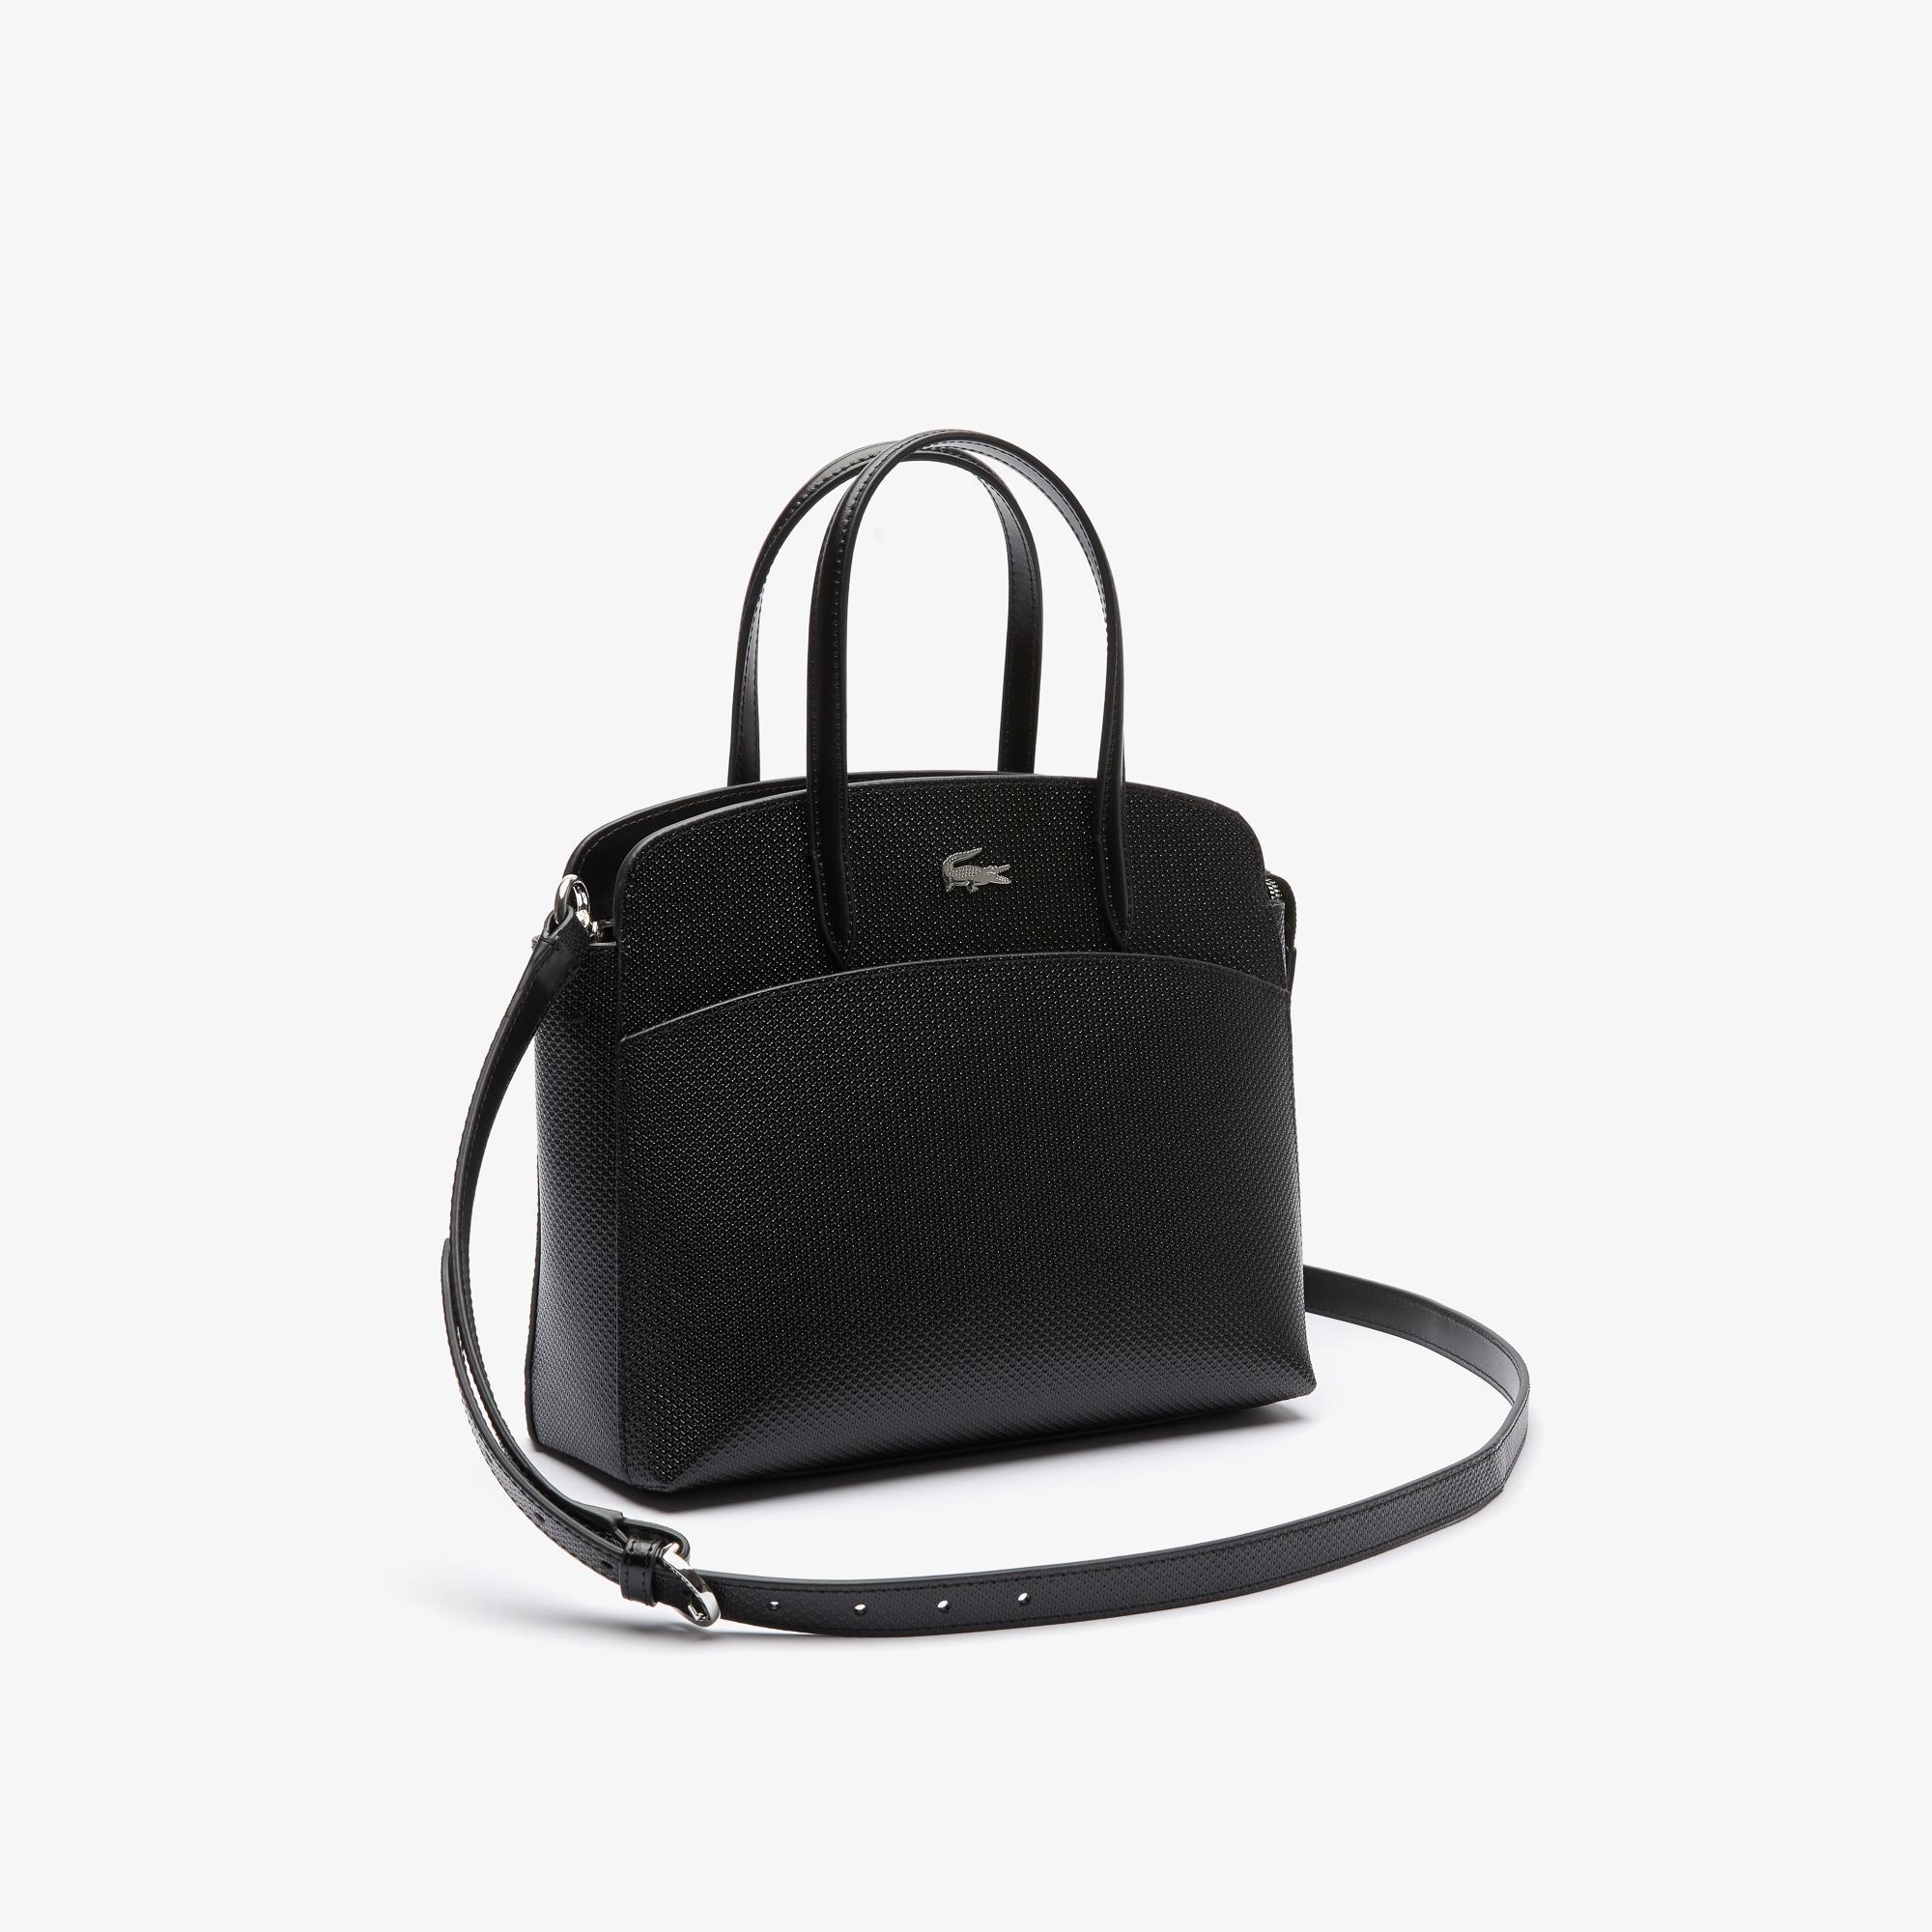 Lacoste Chantaco Classics Kadın Siyah Çanta